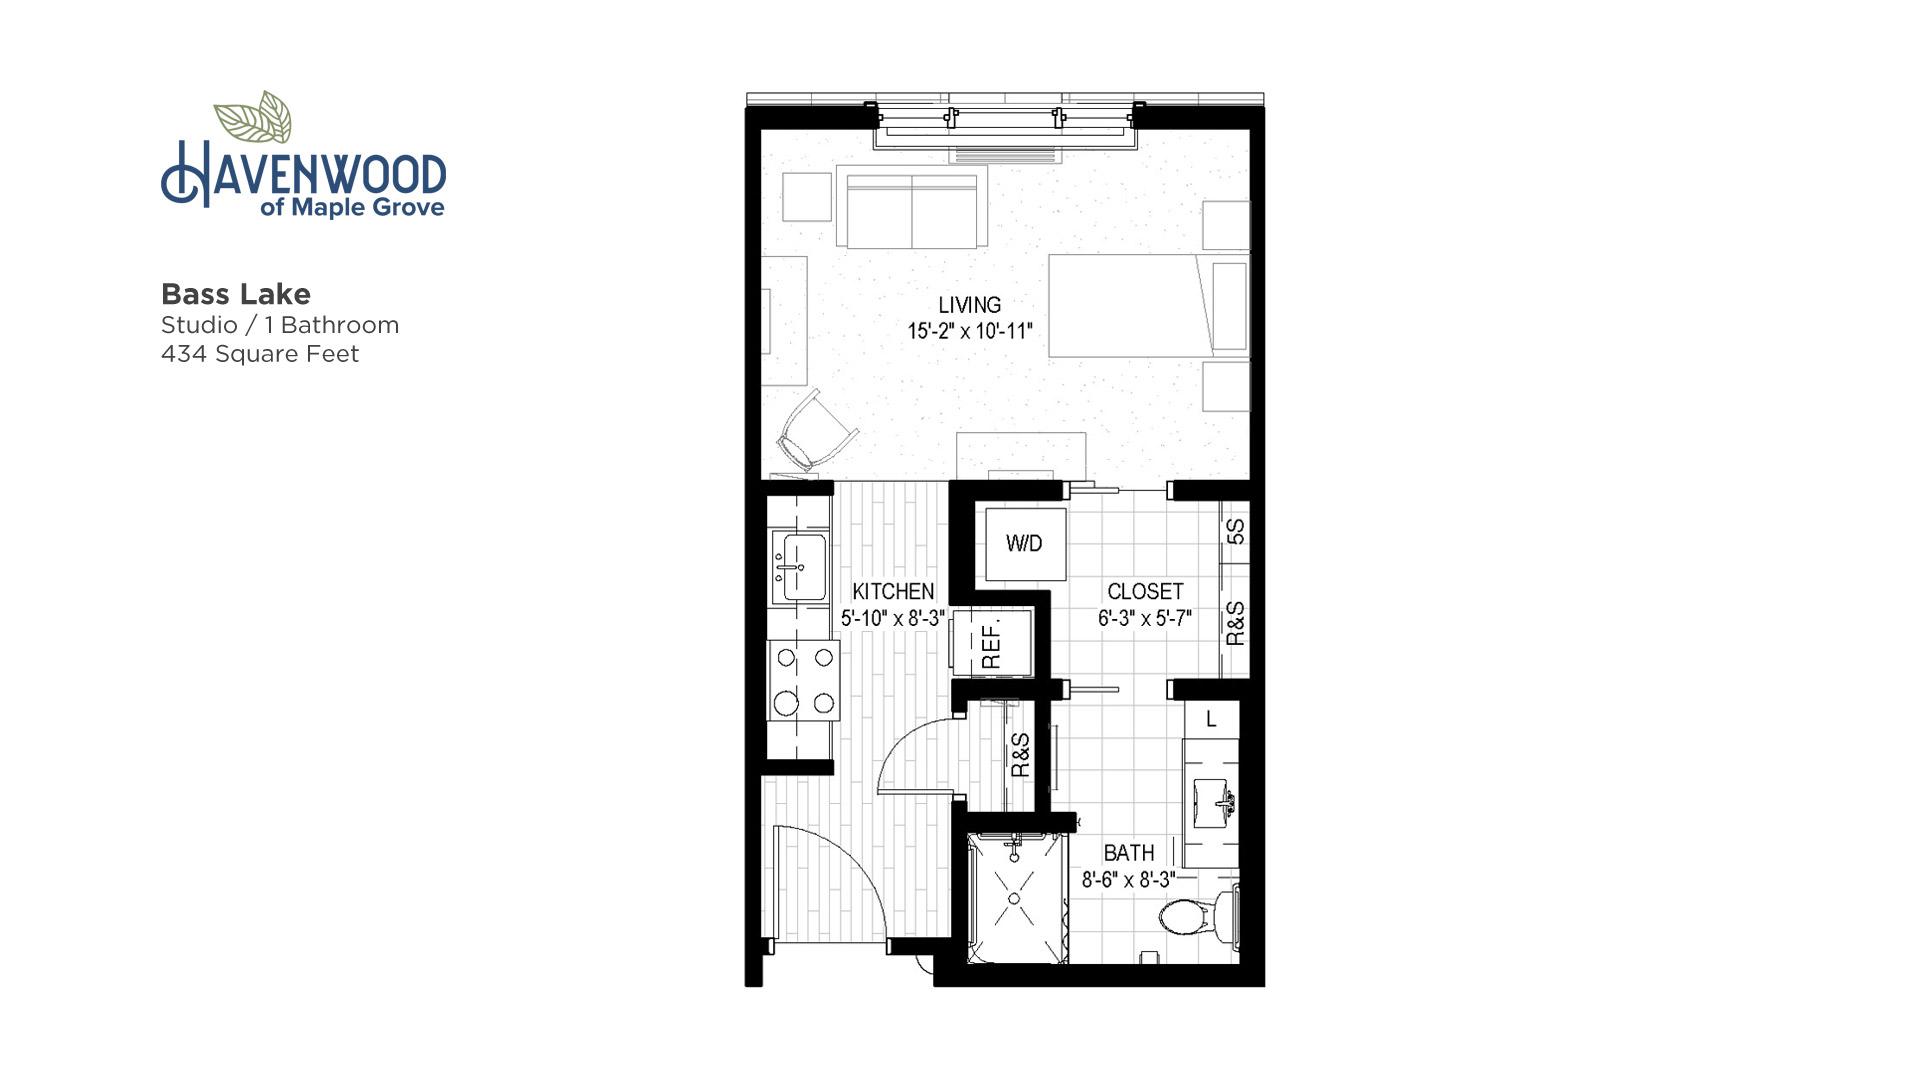 Havenwood of Maple Grove Bass Lake Floor Plan